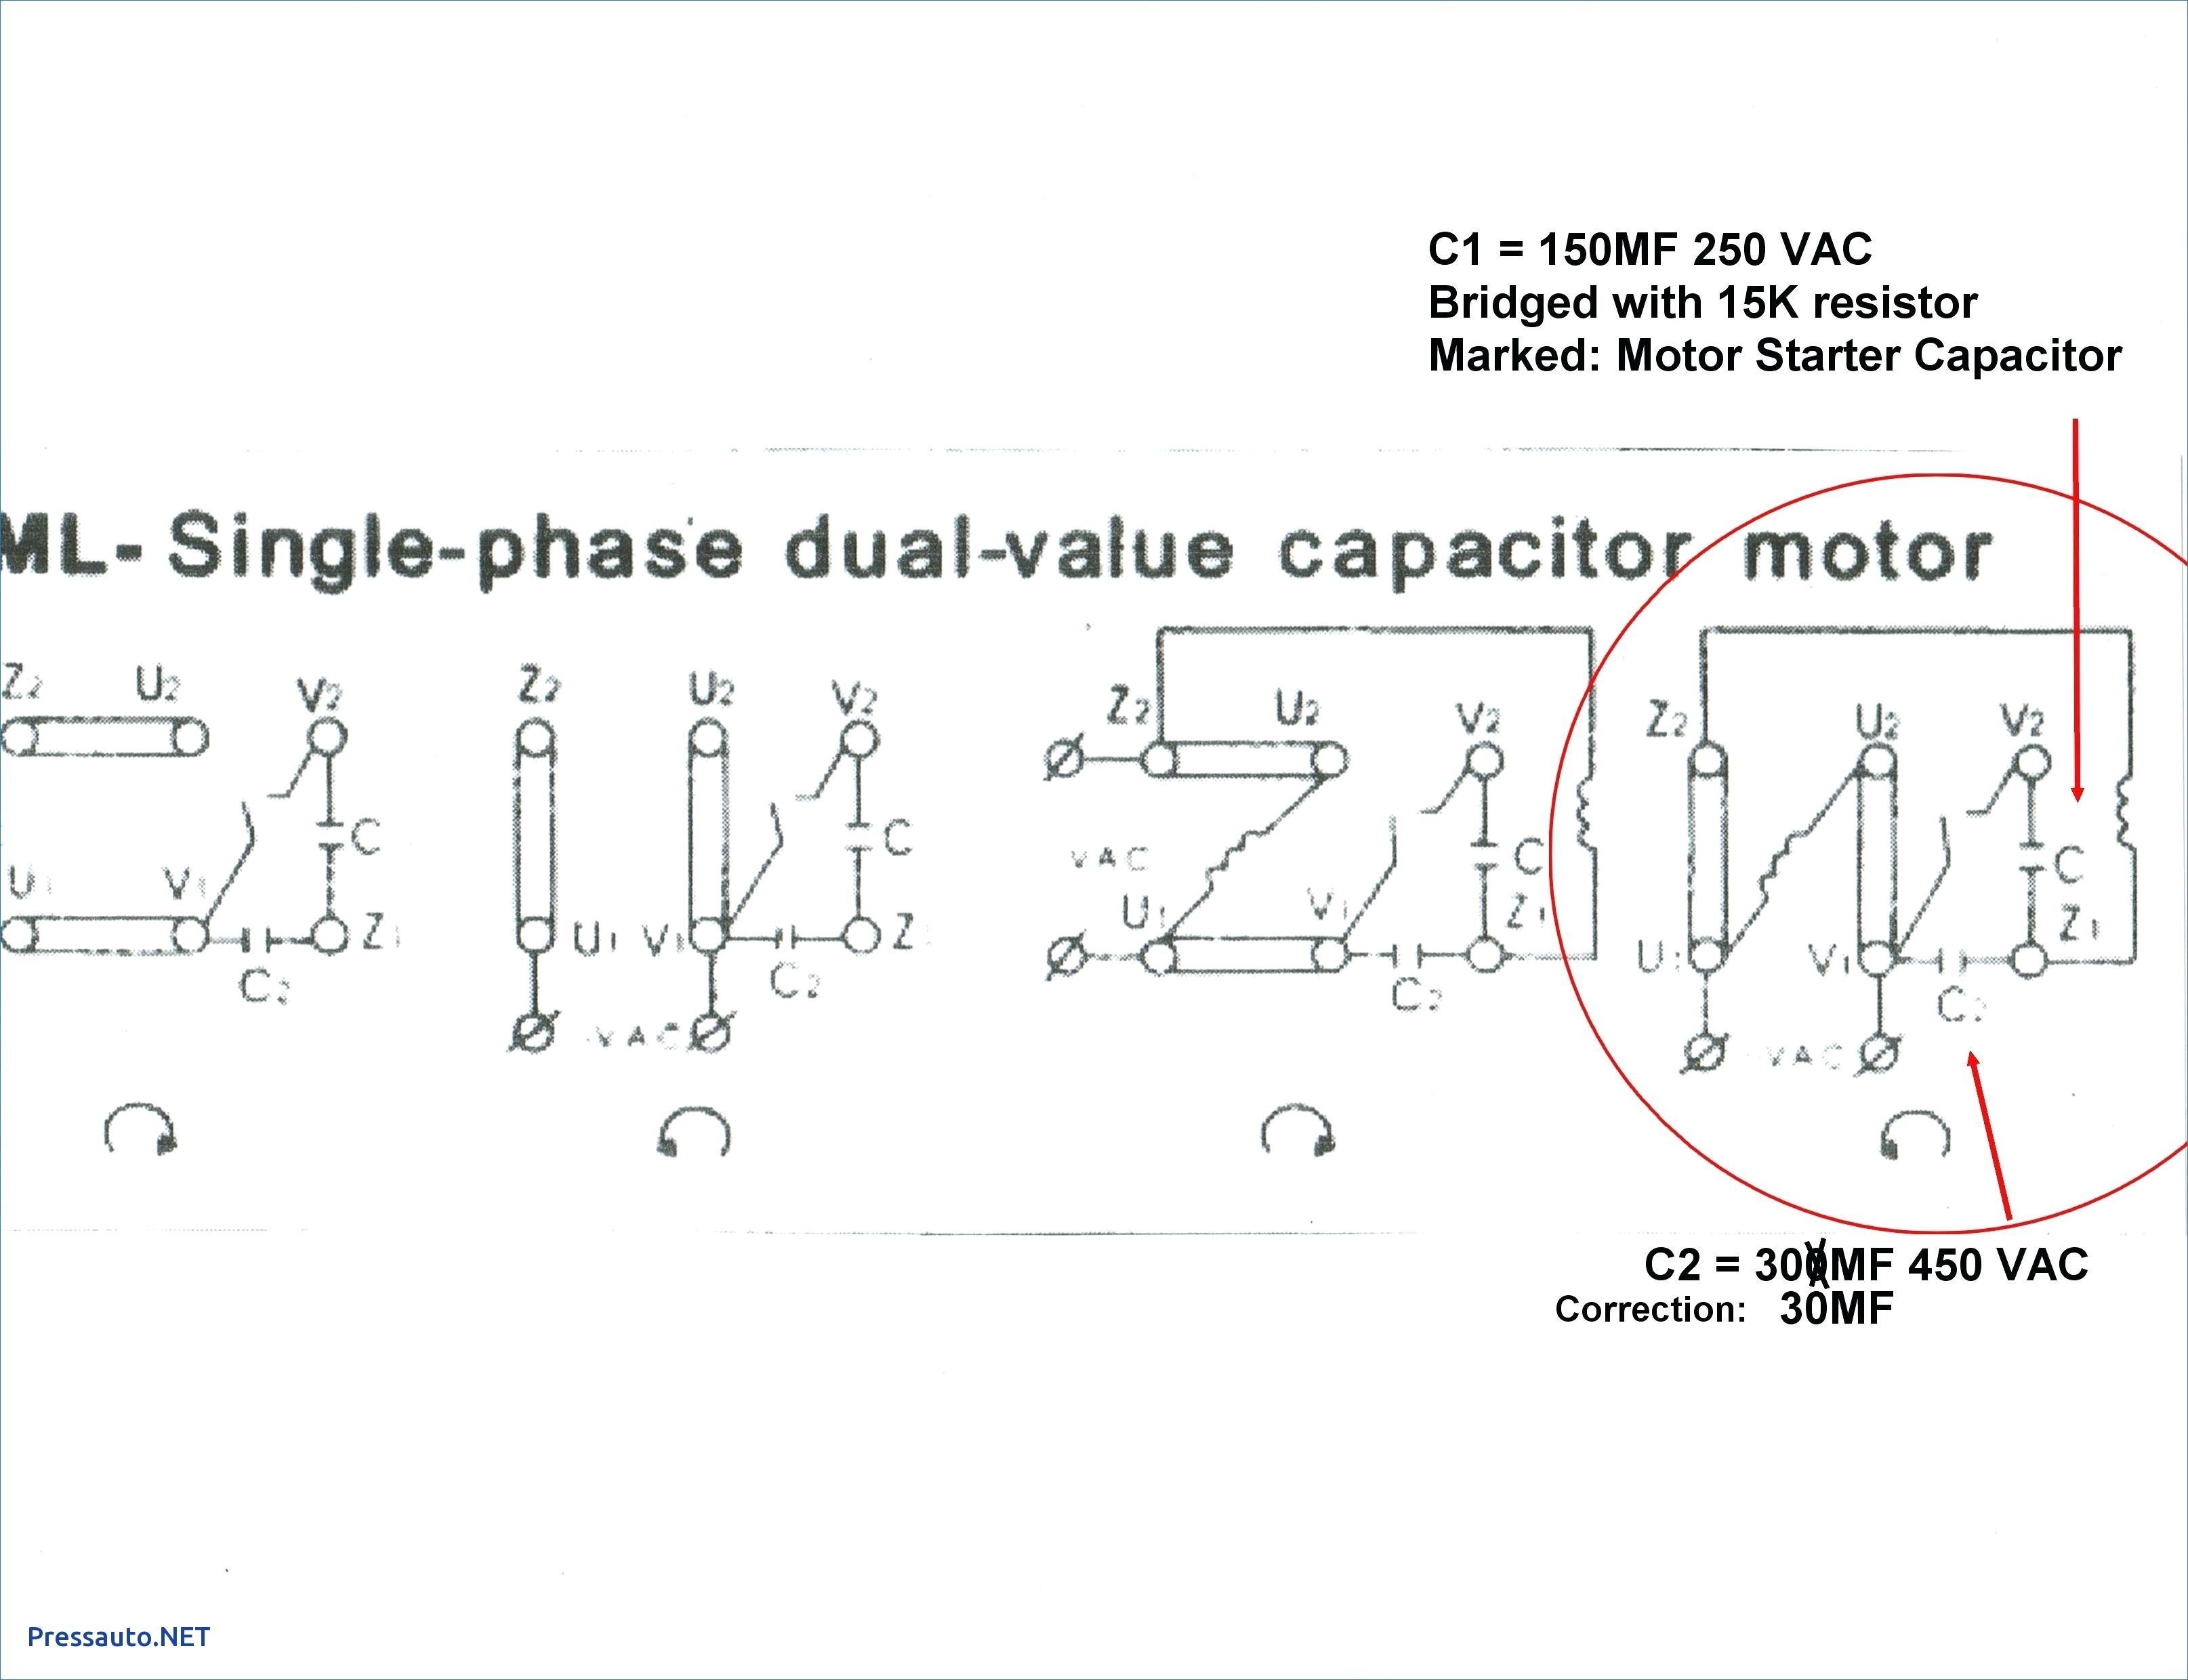 Lenel Access Control Wiring Diagram Lenel 1320 Wiring Diagram Canopi Of Lenel Access Control Wiring Diagram